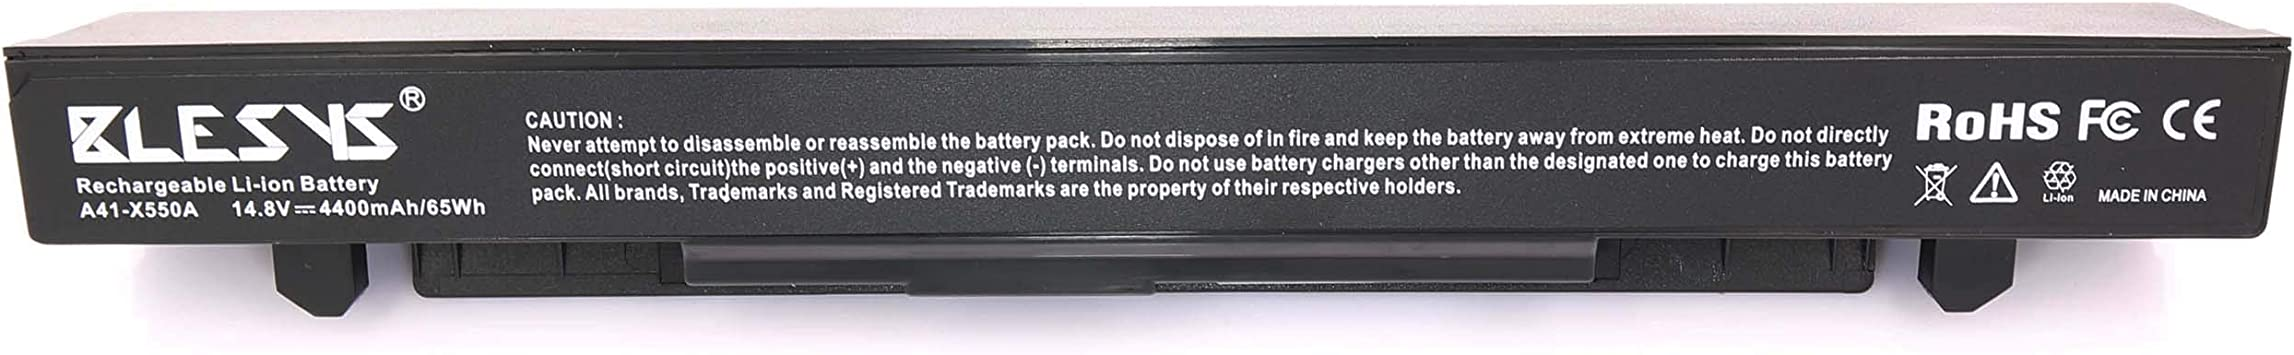 BLESYS 4400mAh A41-X550A Batería para portátil ASUS X550 X550C X550CA X550CC X550CL X550E X450J X452V X550EA X550L X550LA X550LB X550LC X550LD X550V X550VB X550VC X550VL X552C X552CL: Amazon.es: Electrónica